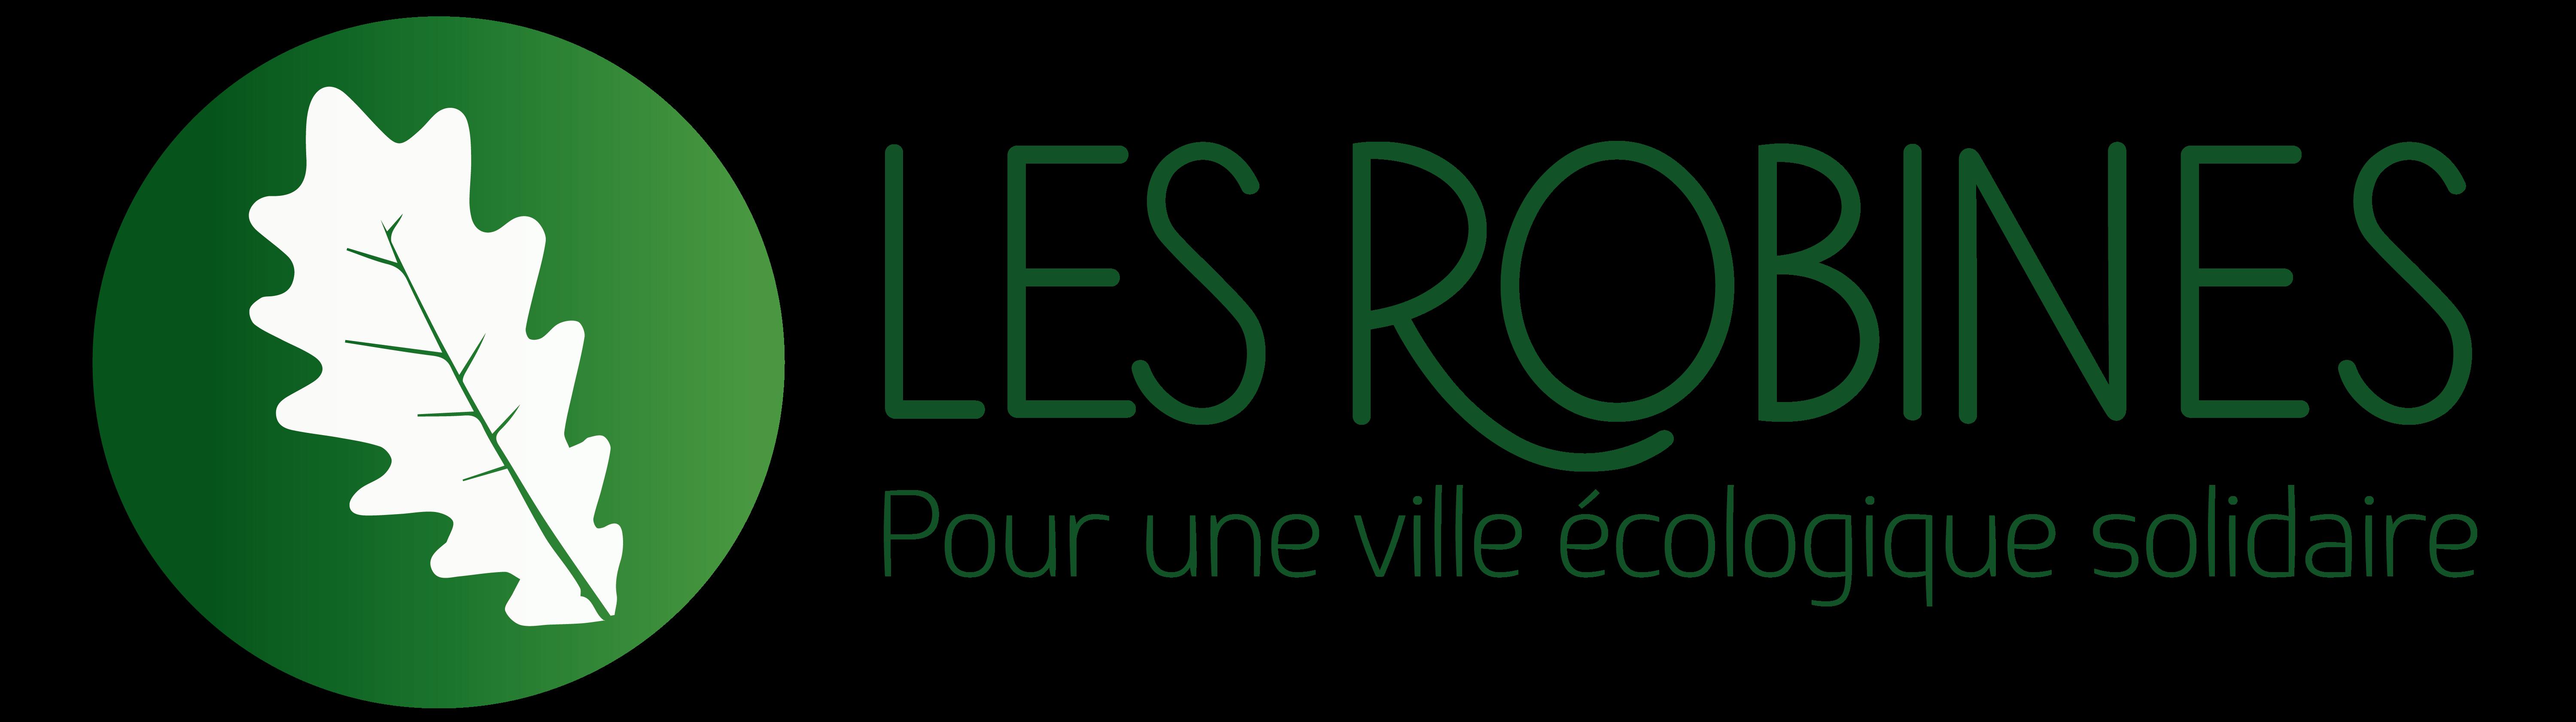 Les Robin.e.s